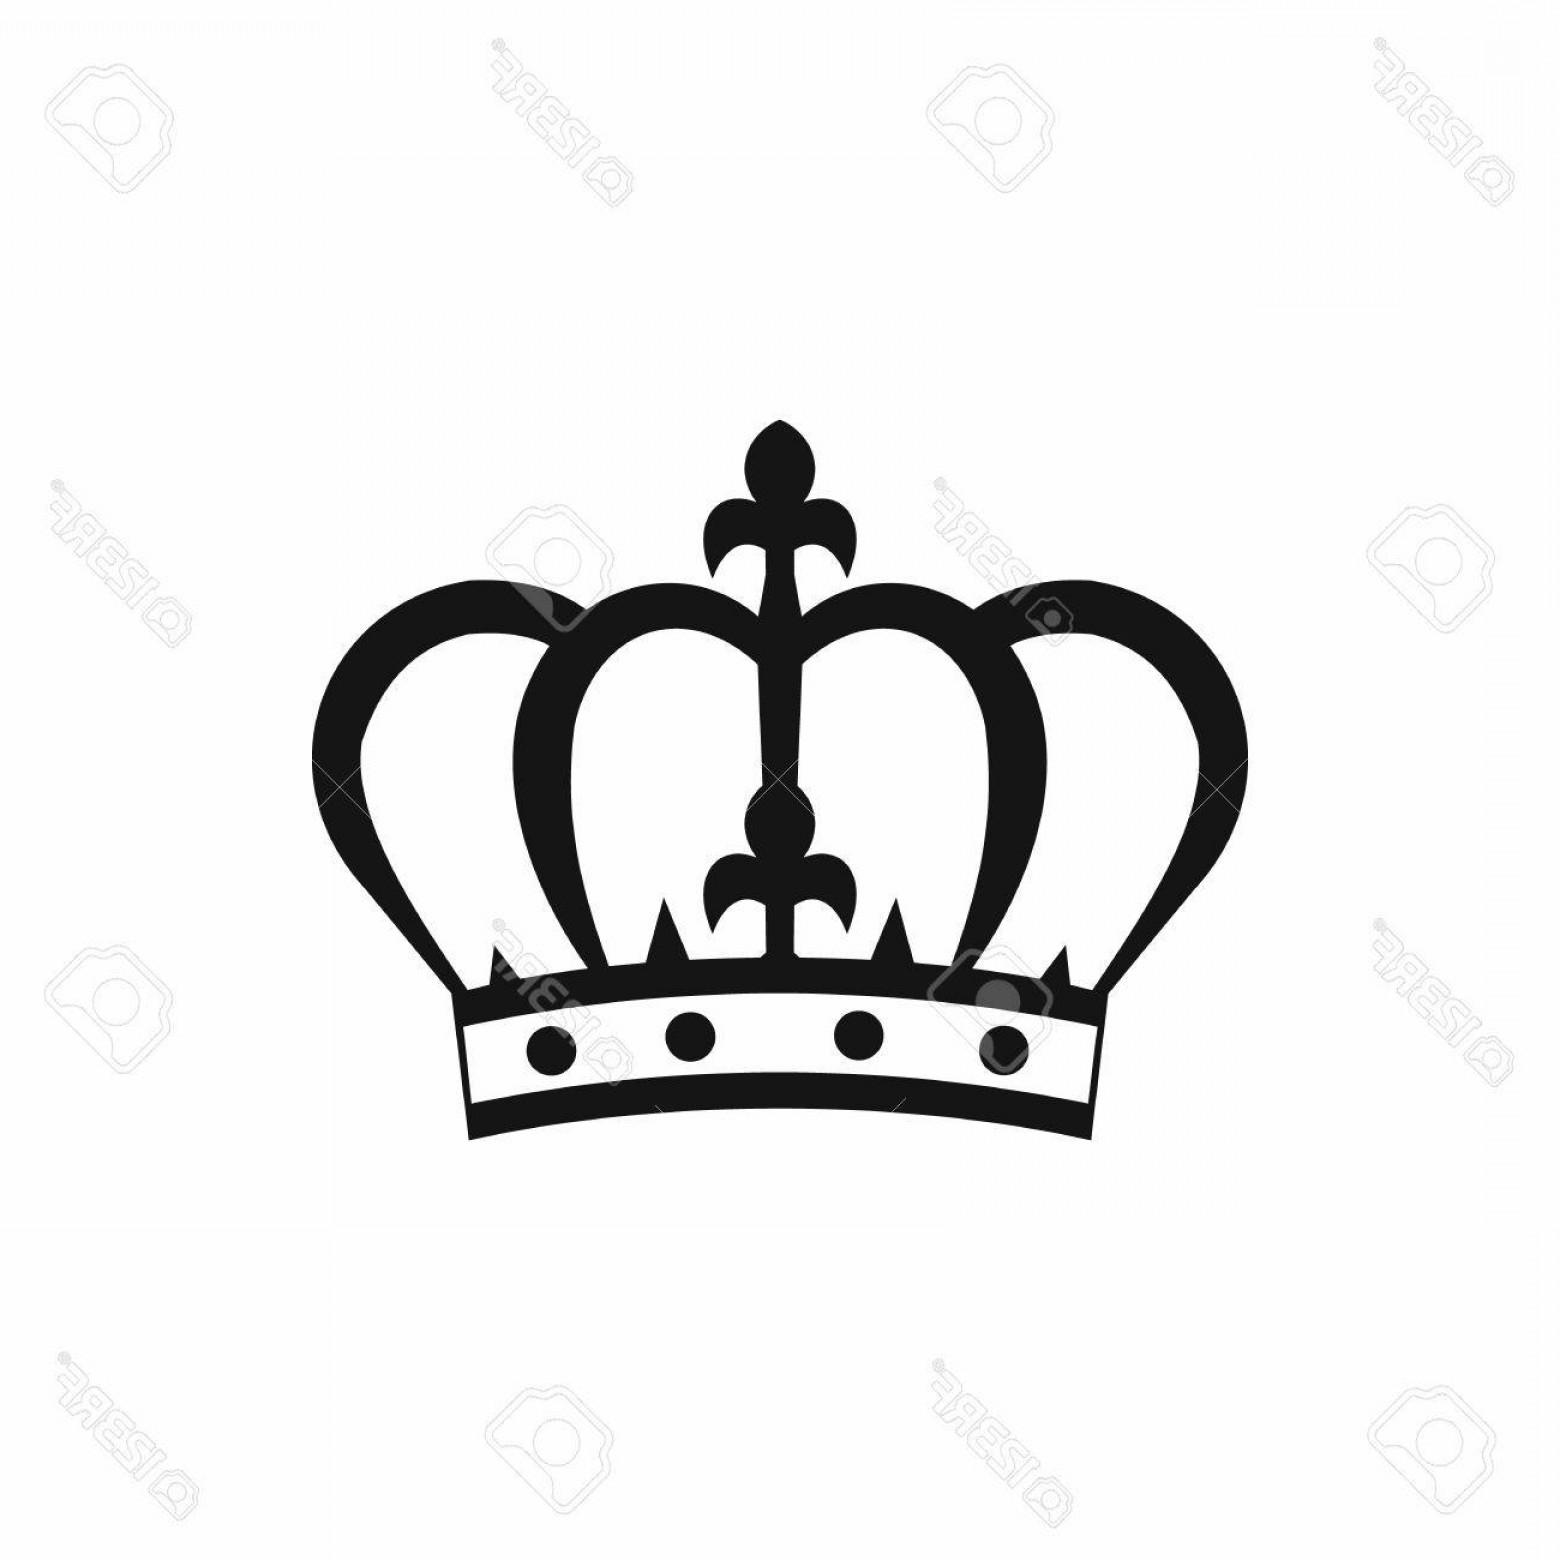 Queen Crown Silhouette At Getdrawings